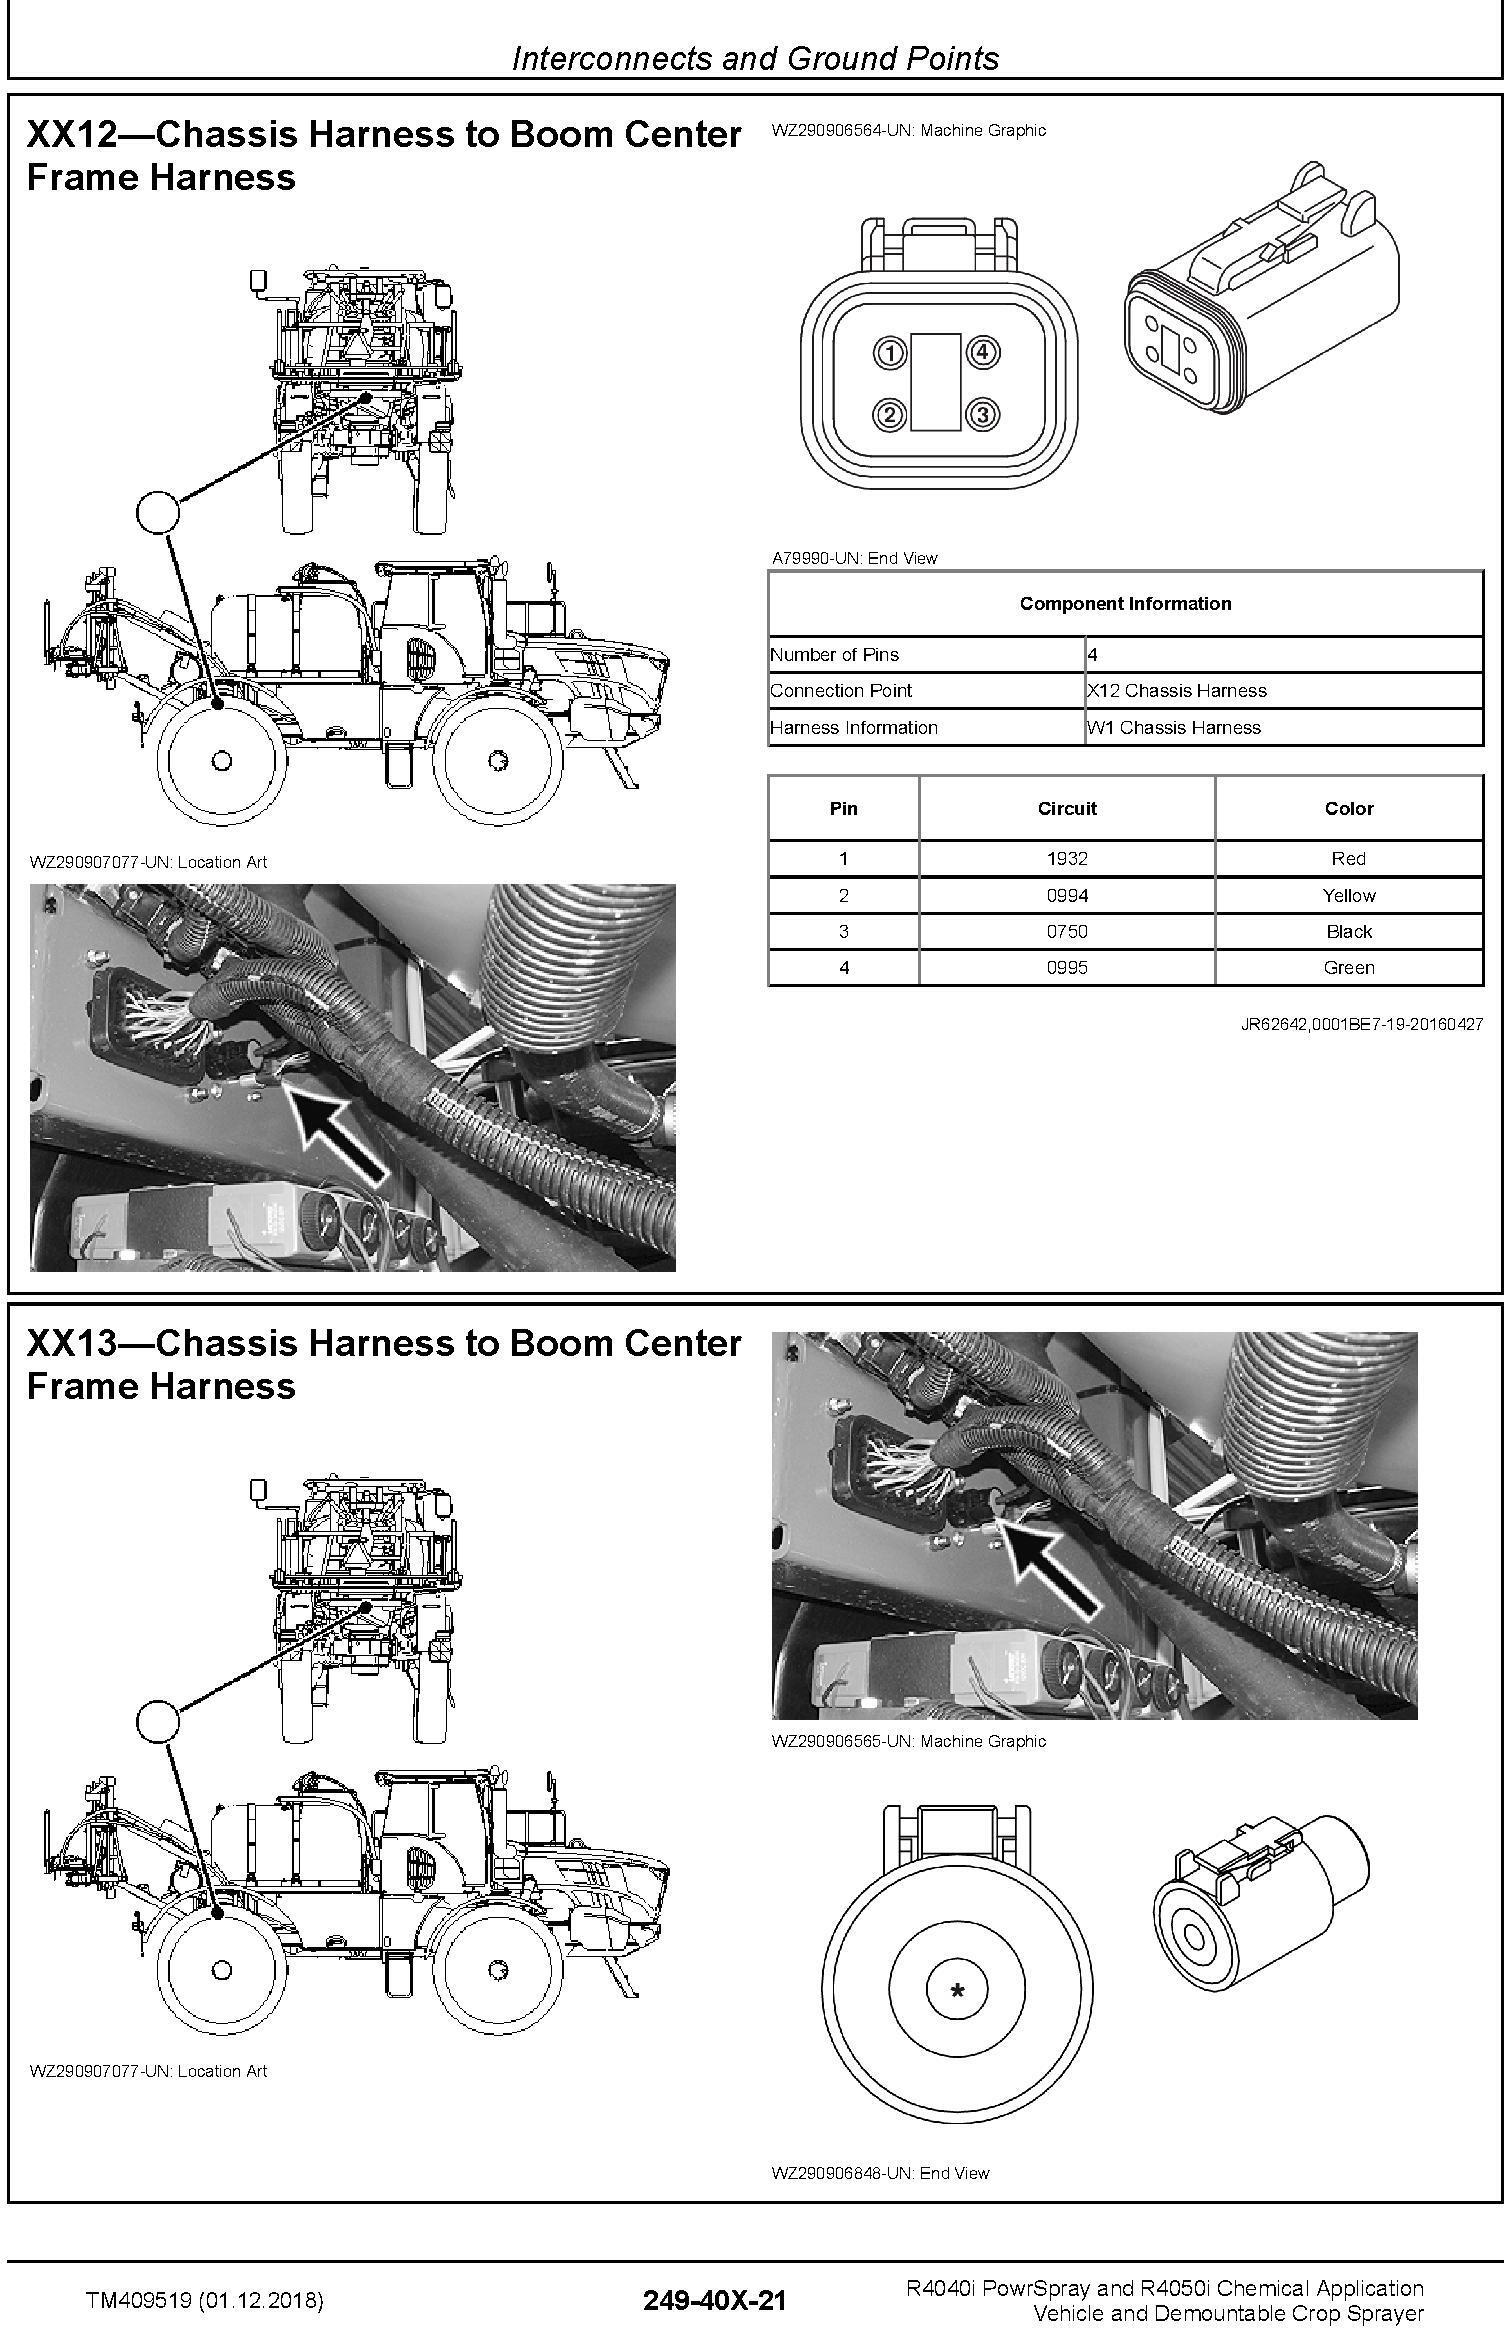 John Deere R4040i, R4050i Demountable Crop Sprayer (MY18) Diagnostic Technical Service Manual (TM409519) - 2